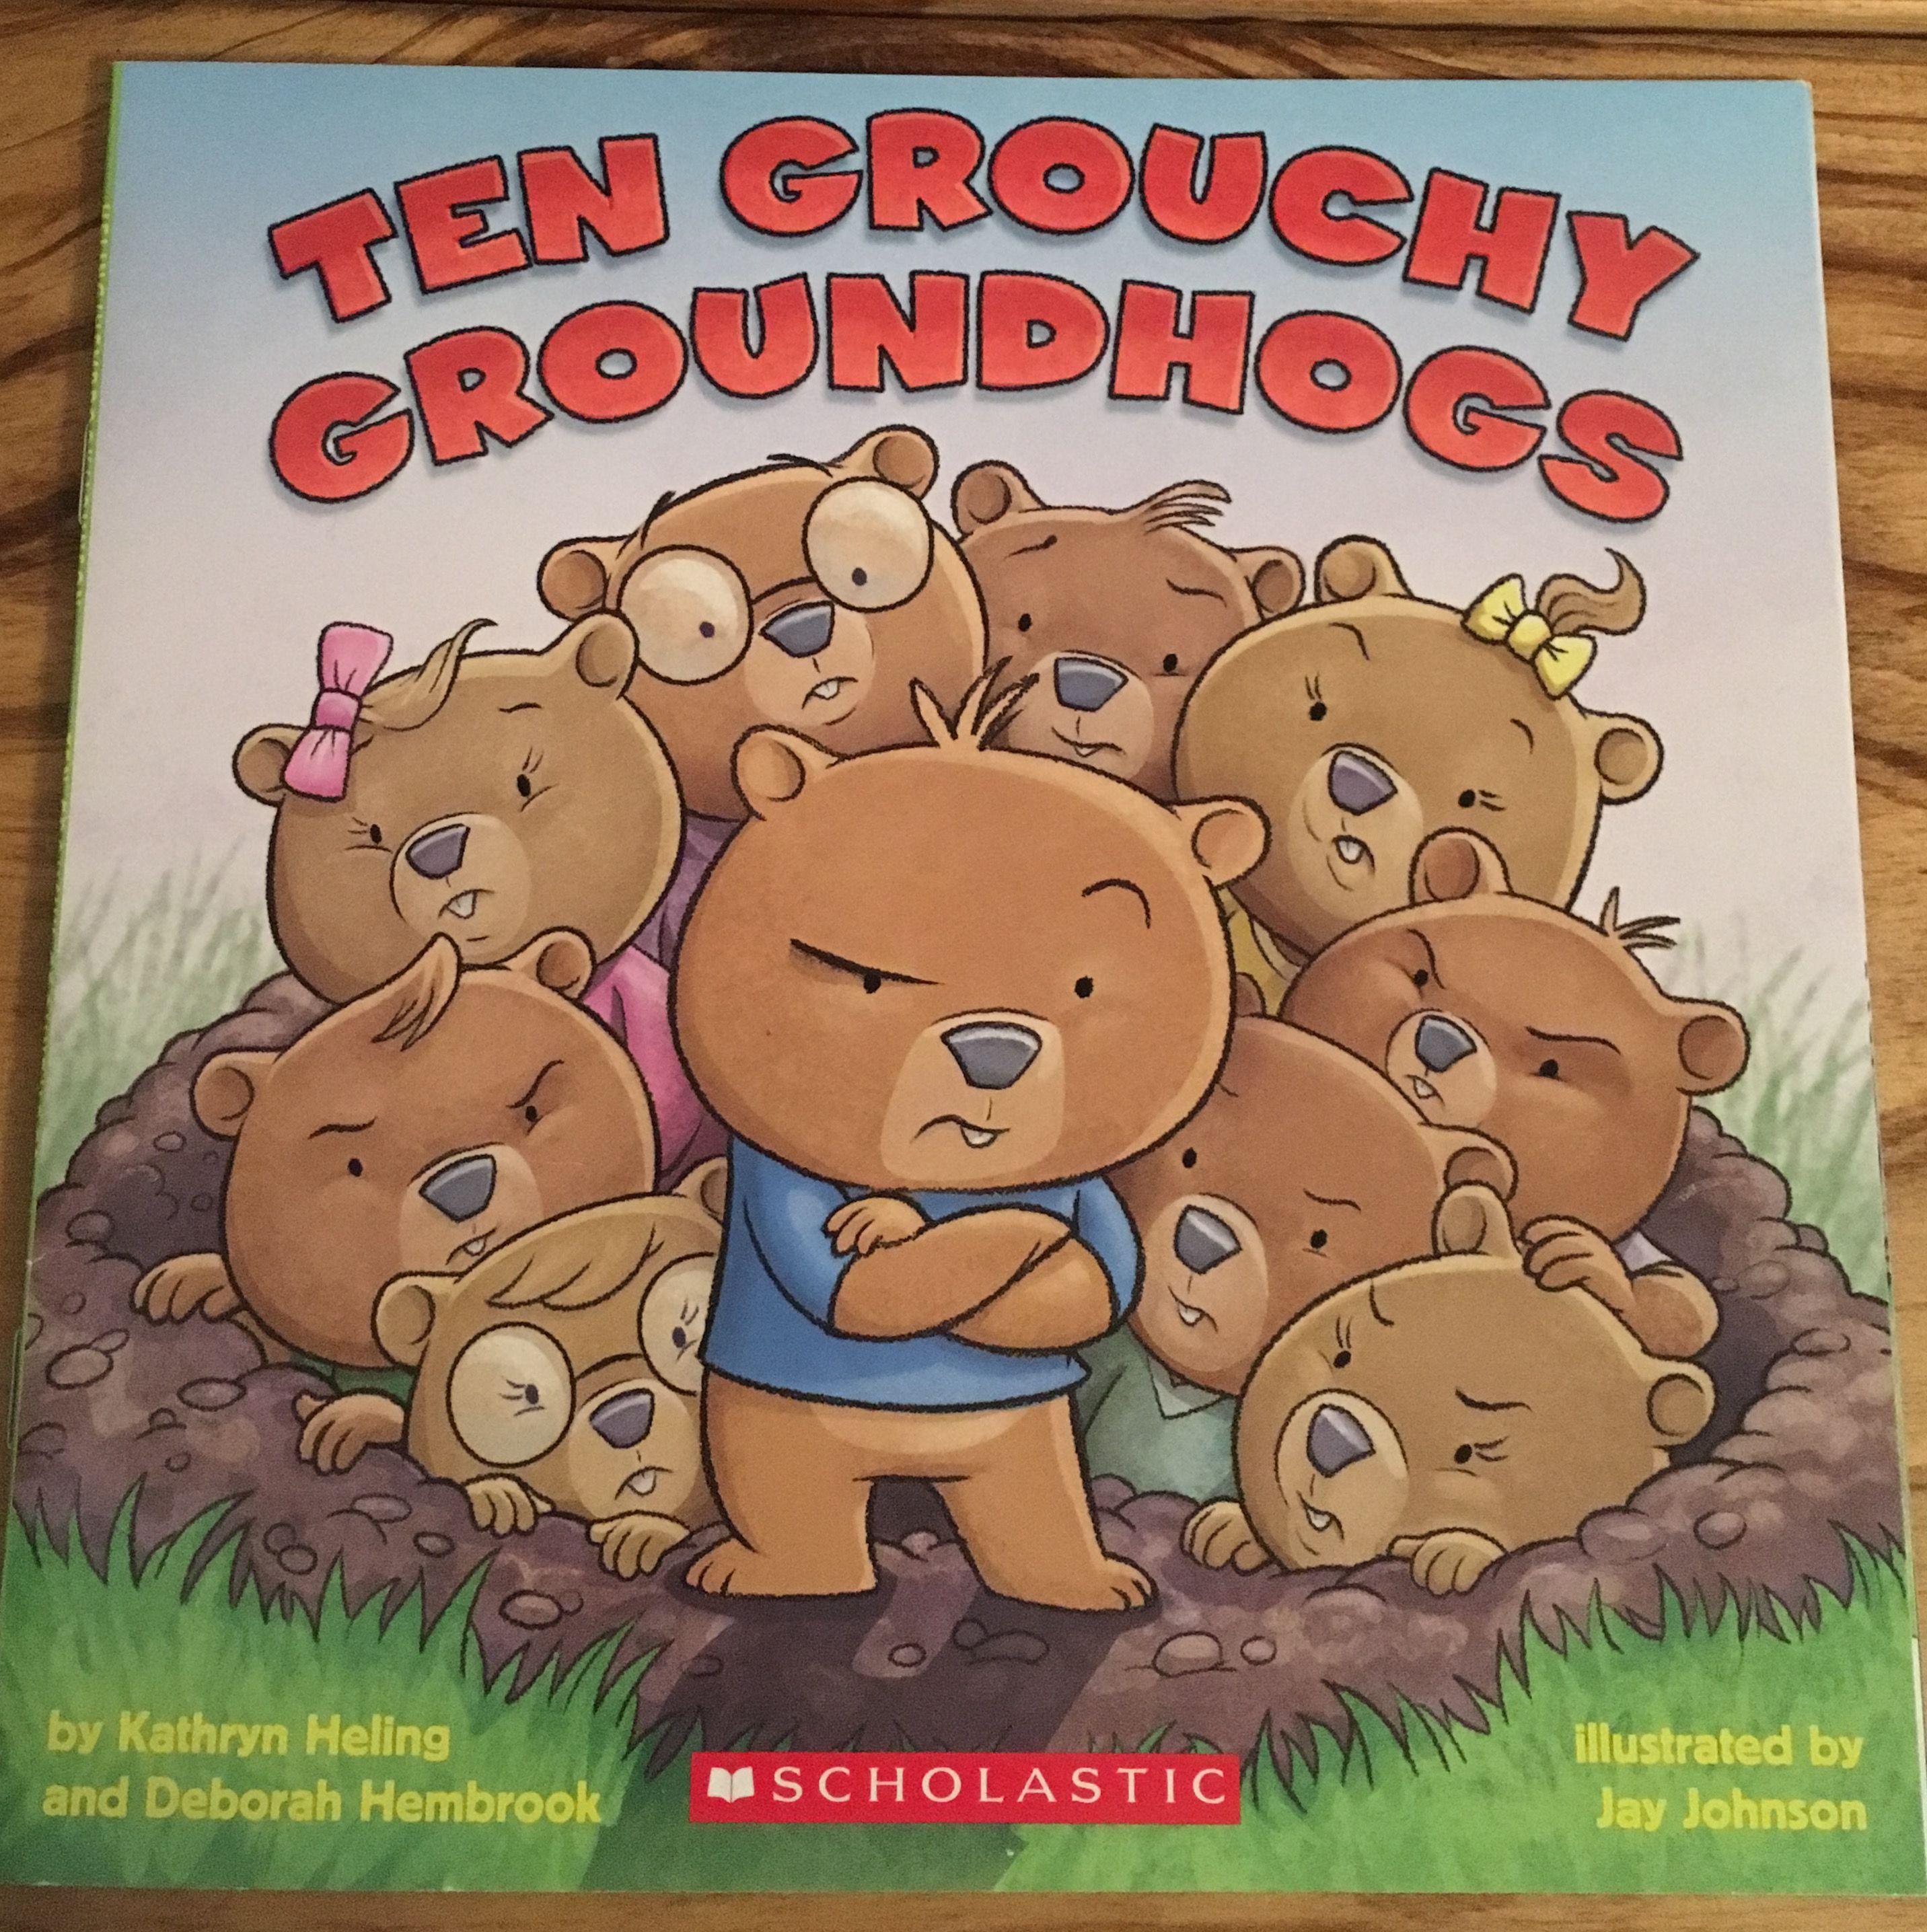 Ten Grouchy Groundhogs Activity Kit